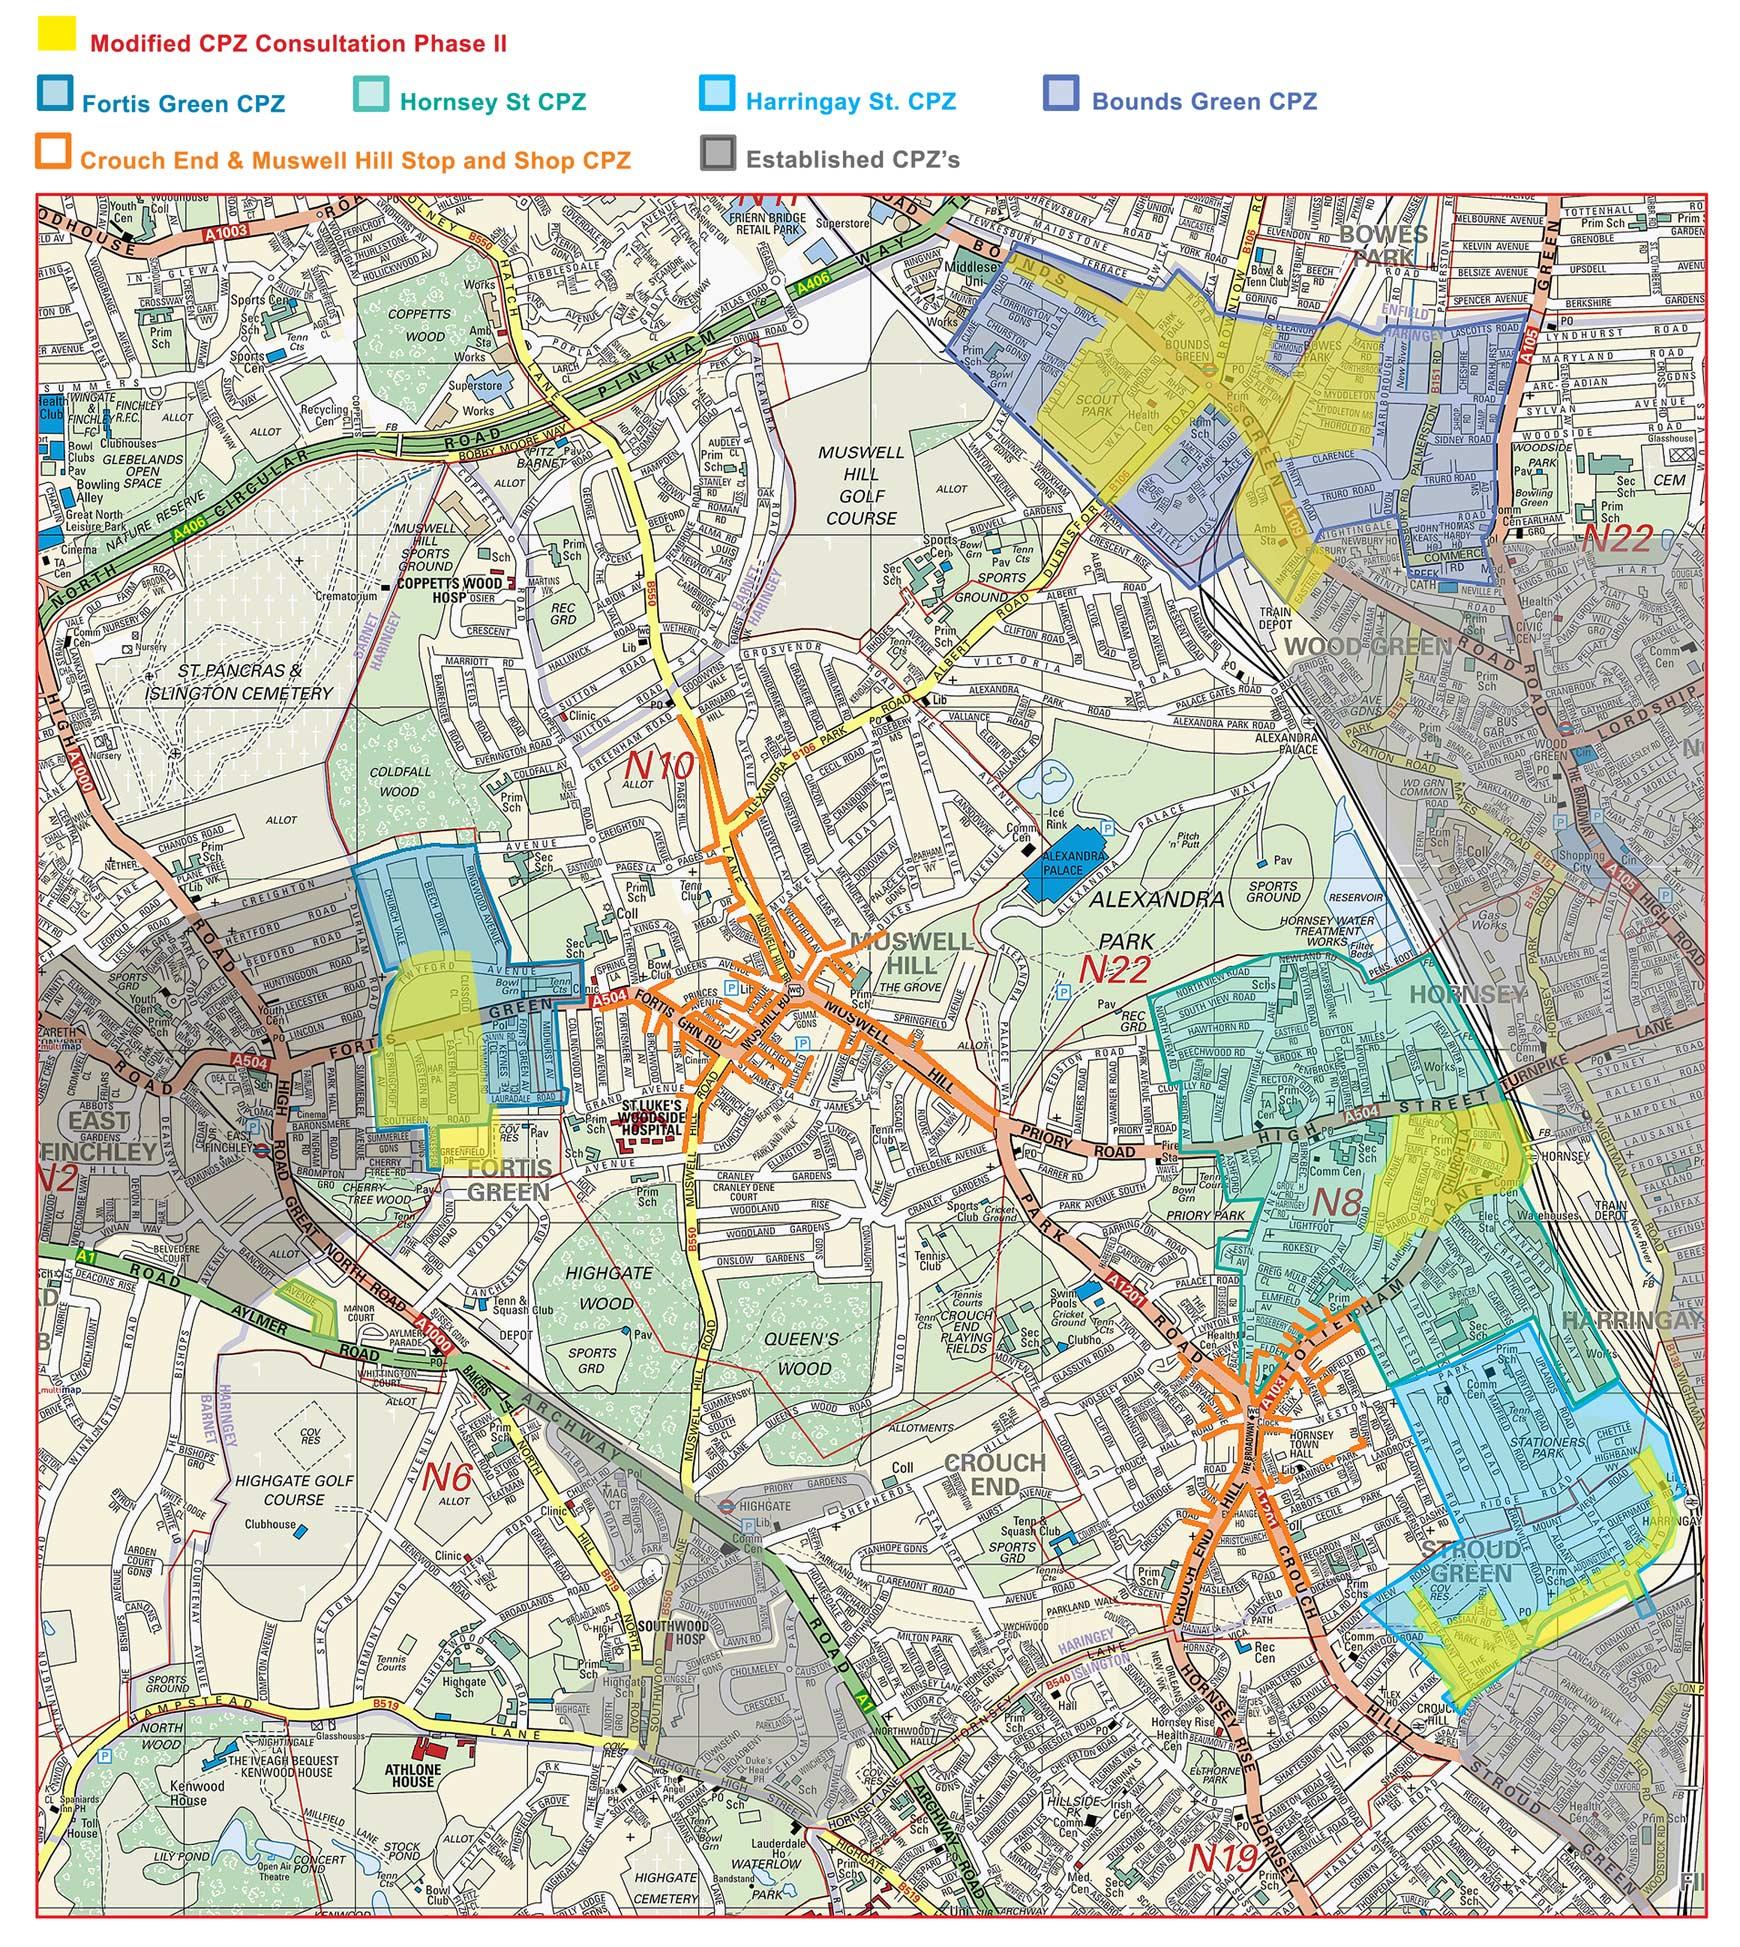 2006 CPZ Consultation pahse 2 all zones map